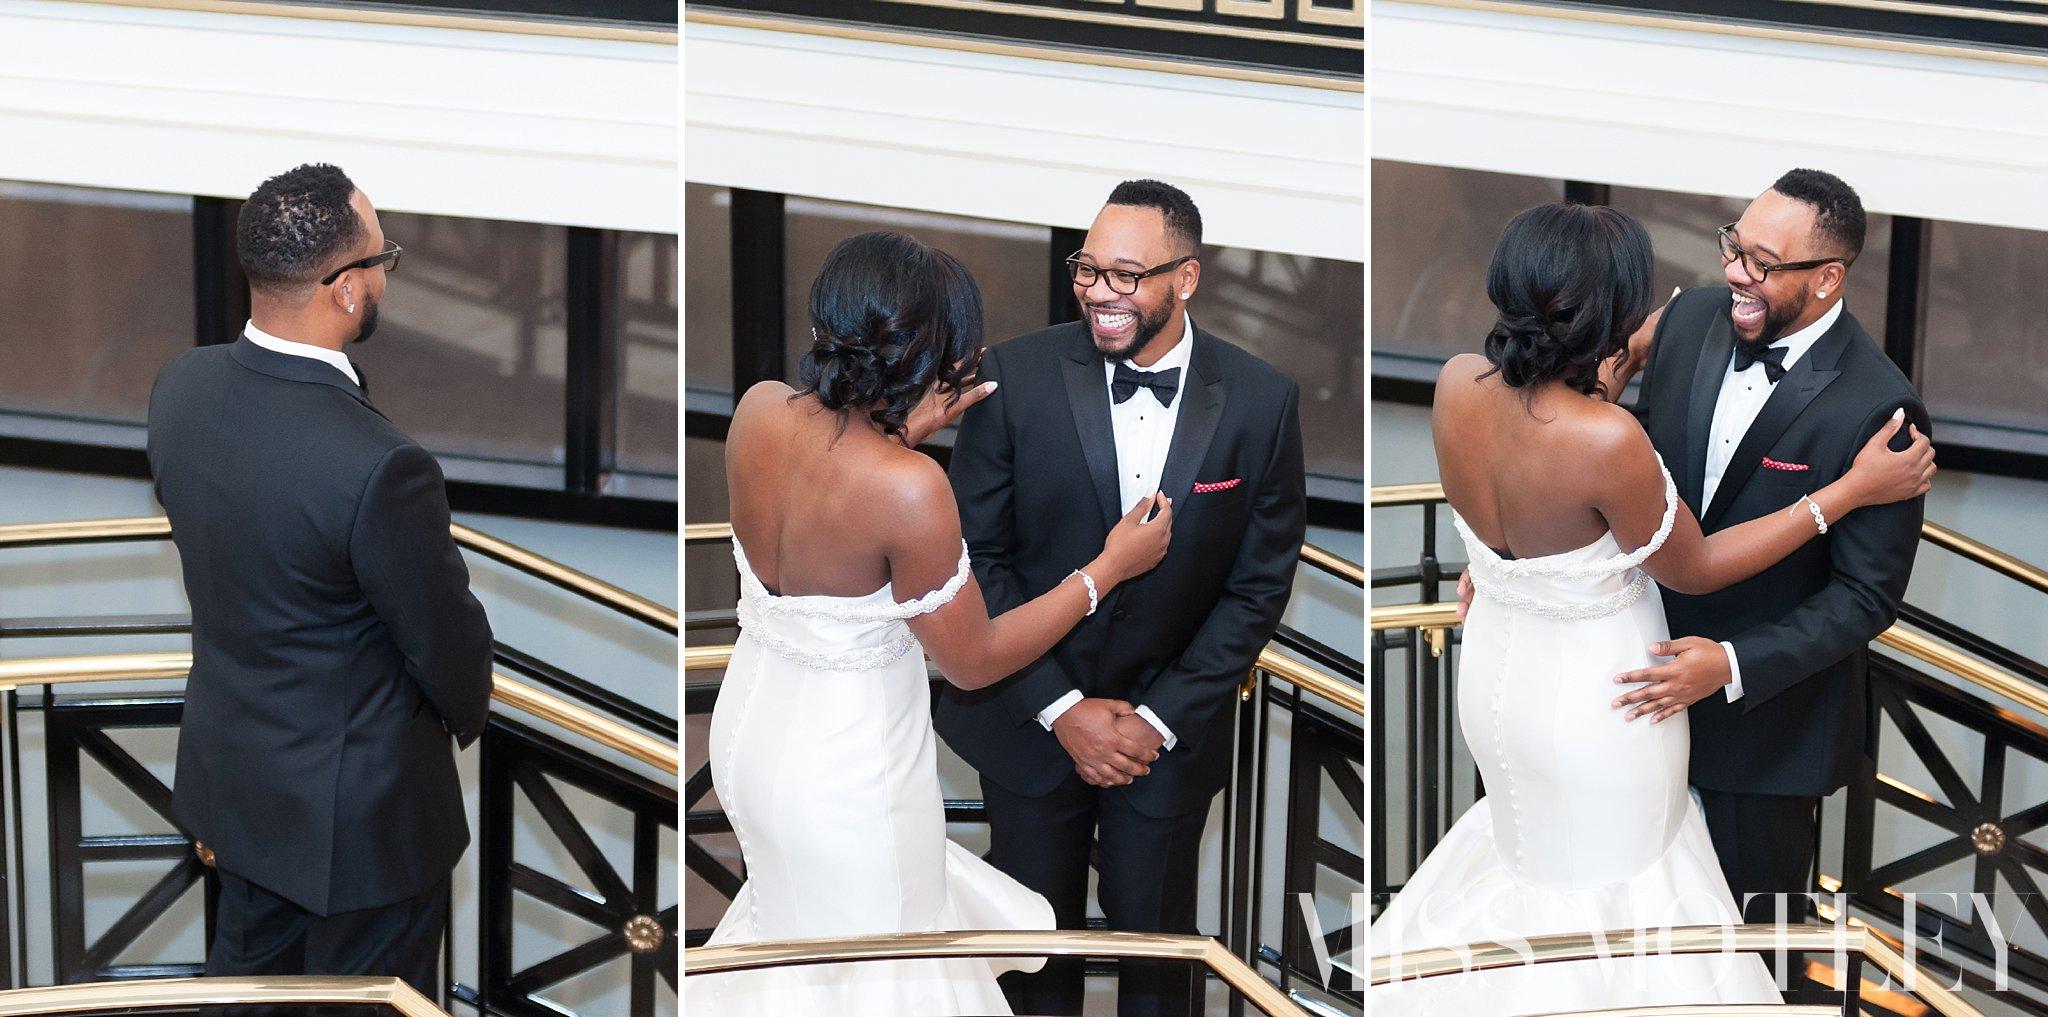 Chicago_wedding_photography_0548.jpg